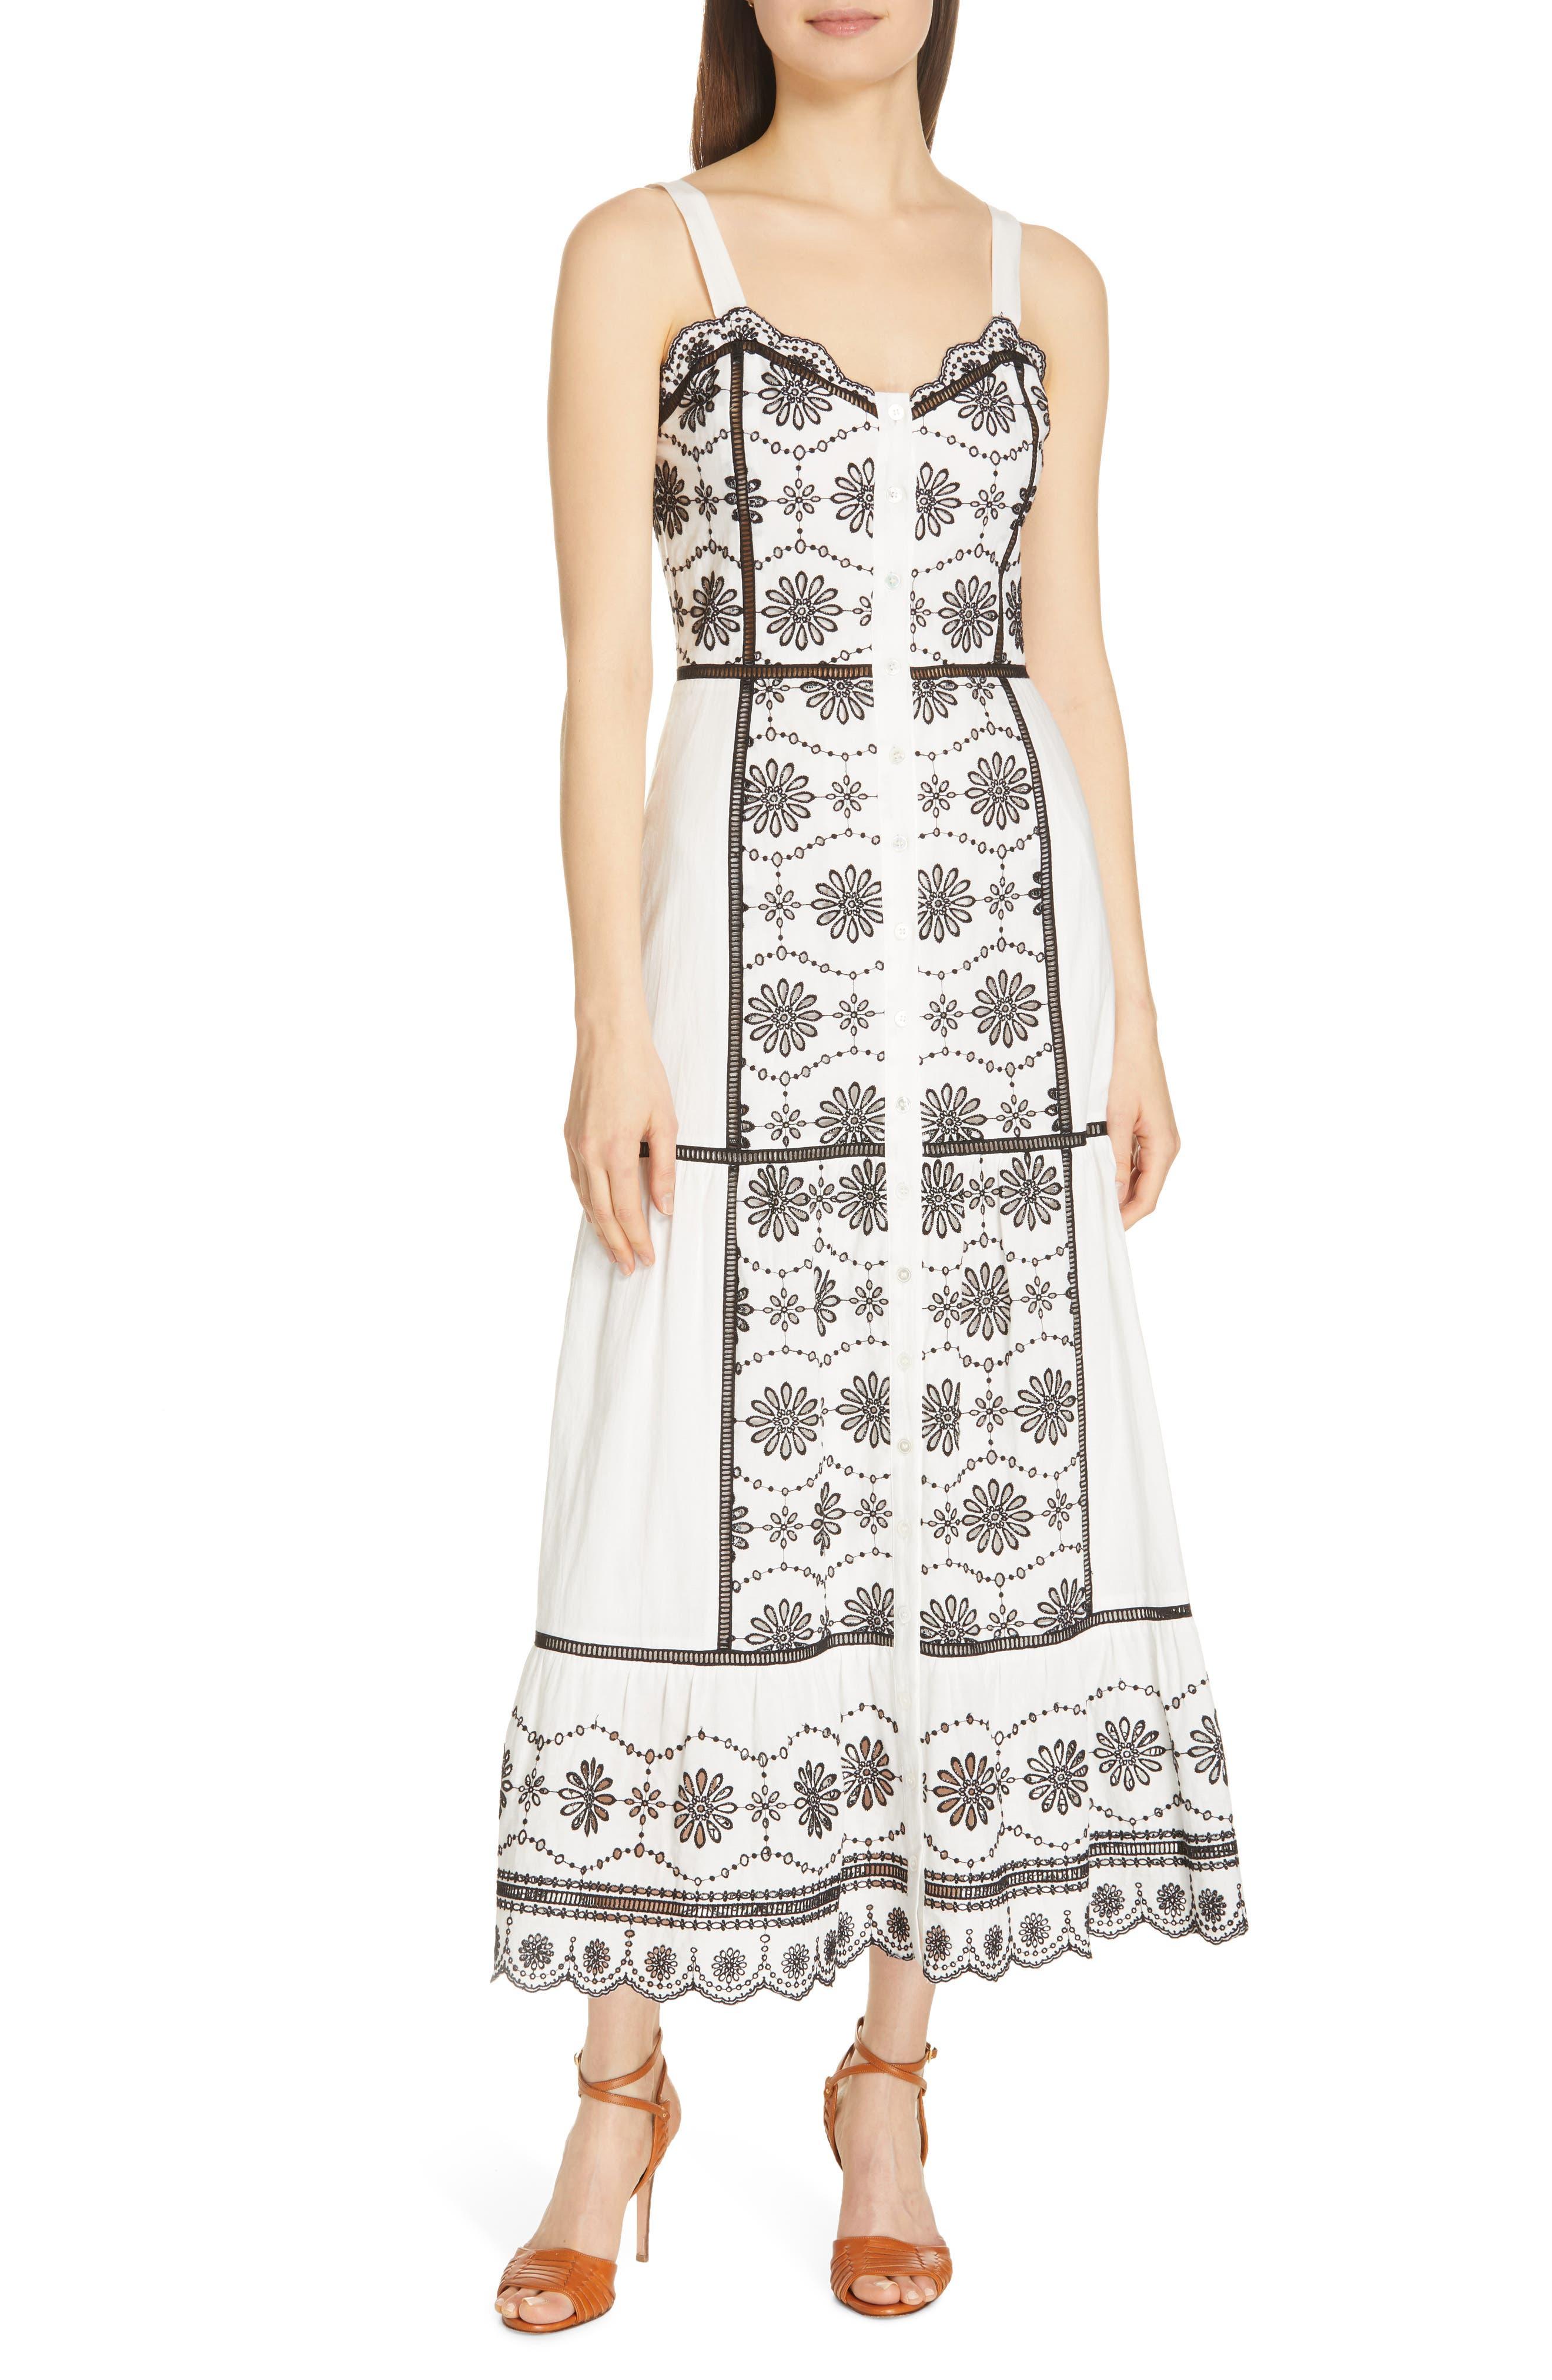 VERONICA BEARD, Sasha Broderie Anglaise Dress, Main thumbnail 1, color, BLACK/ WHITE